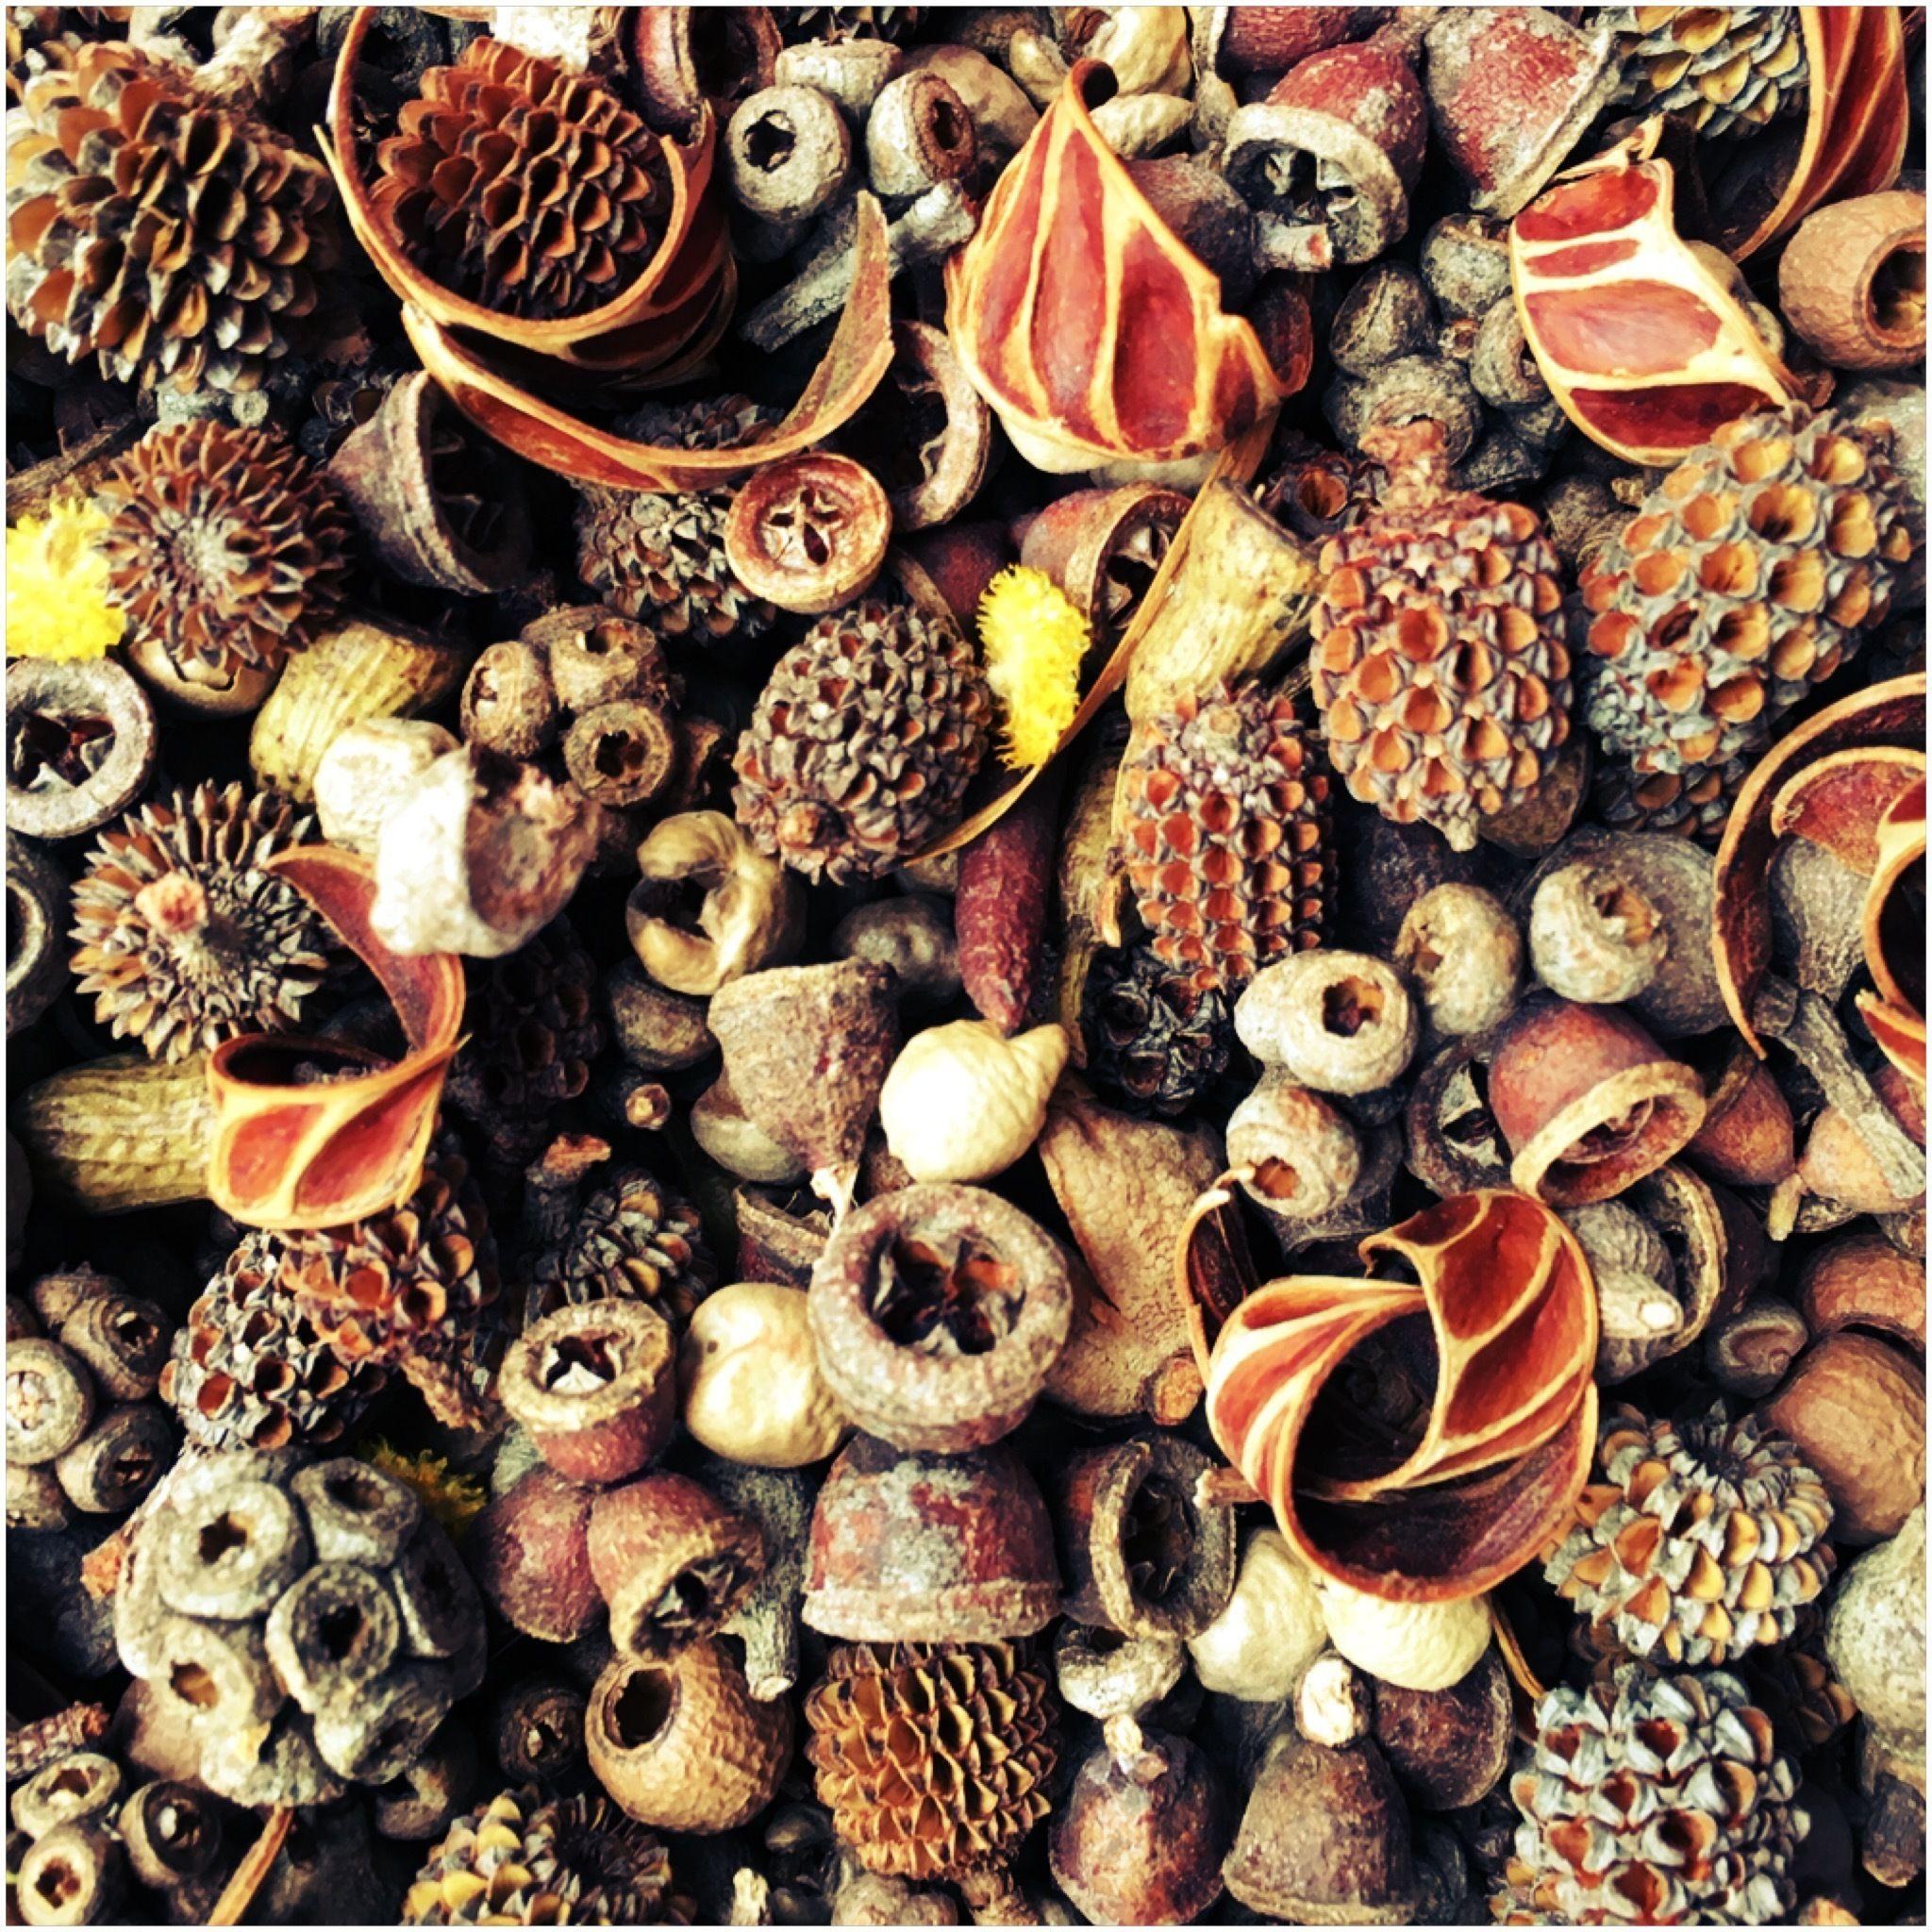 Native Australian Seed Pod Mix SMALL AU12.00 A beautiful